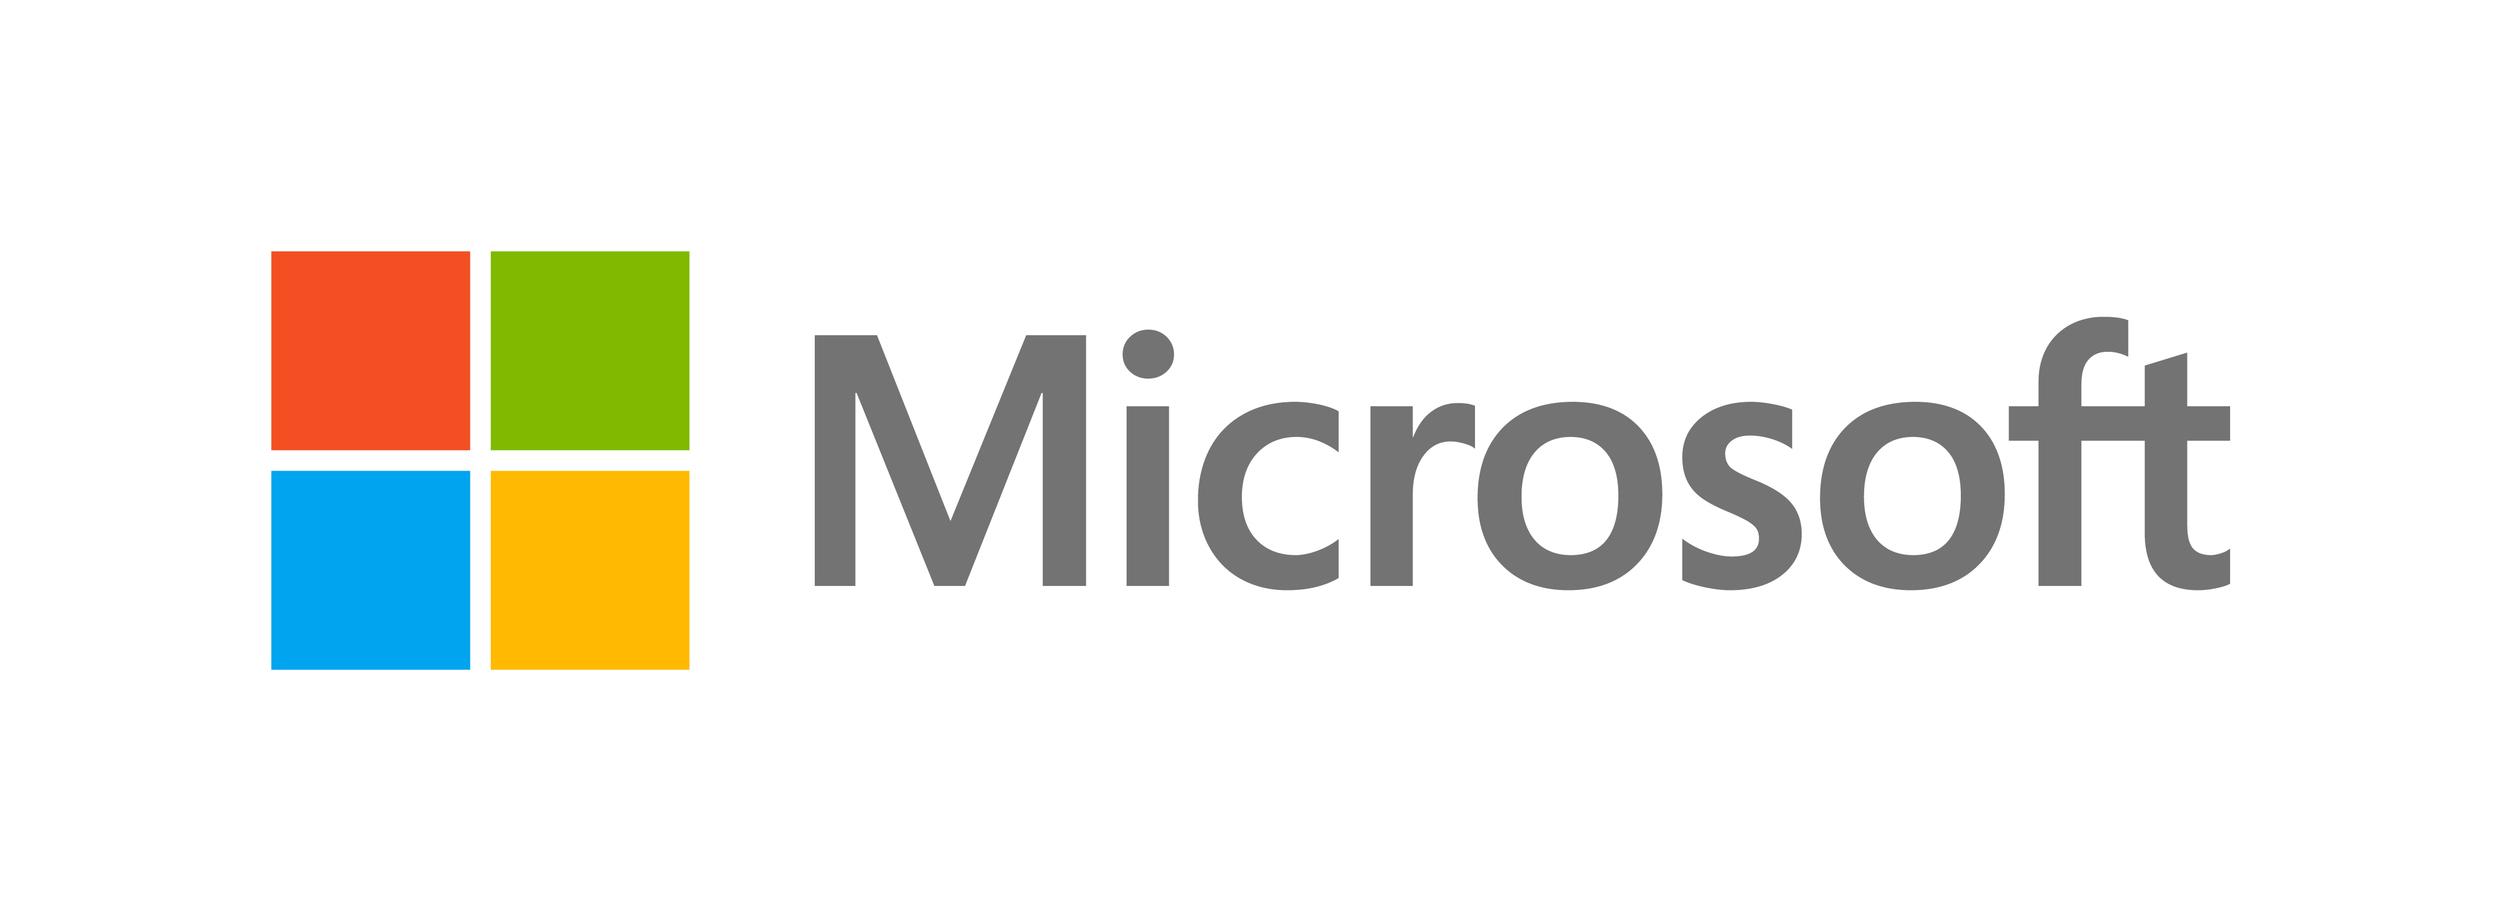 8867.Microsoft_5F00_Logo_2D00_for_2D00_screen.jpg